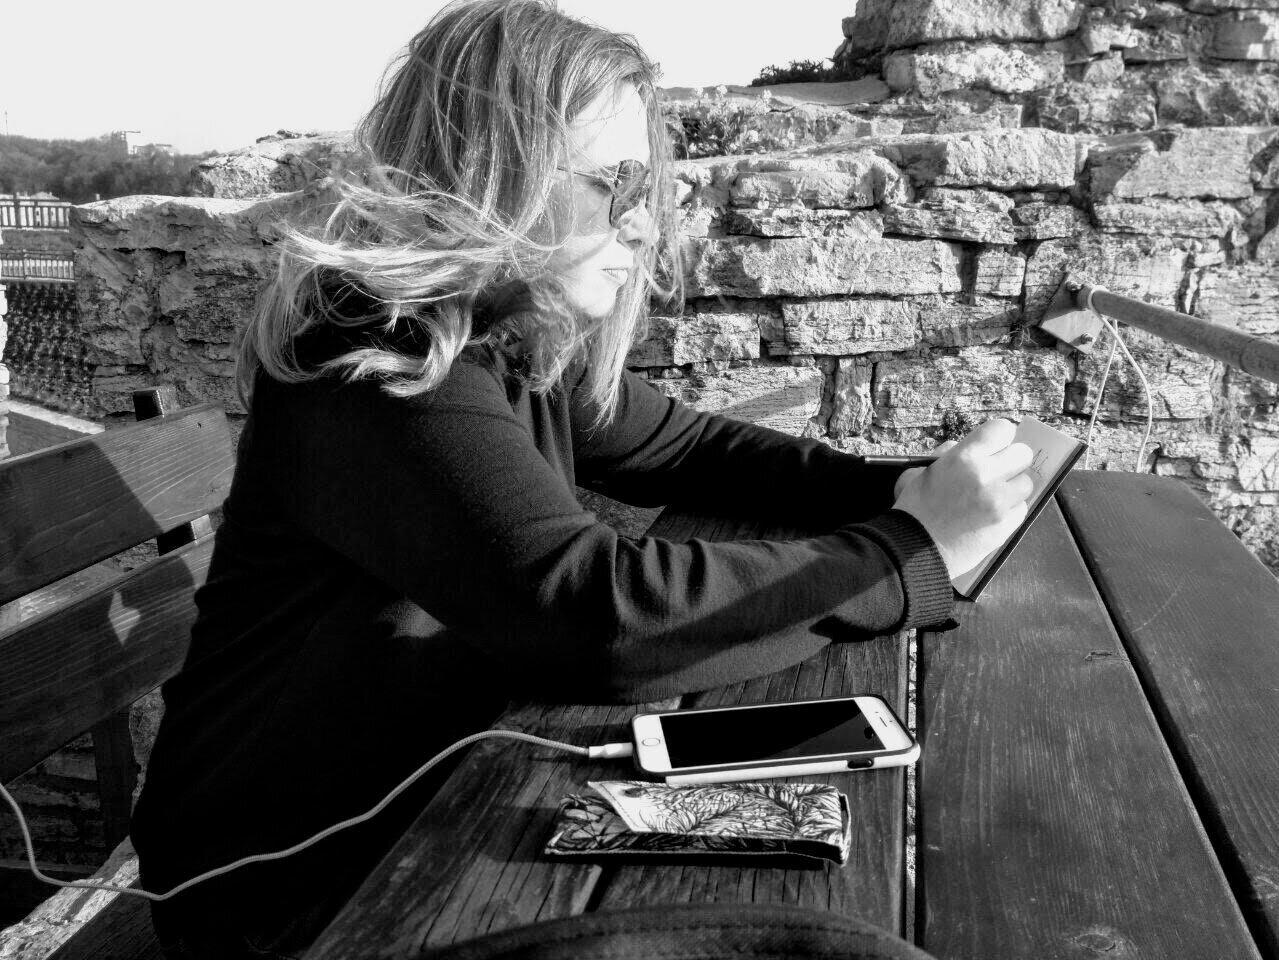 Yevgenia Watts sketching on location